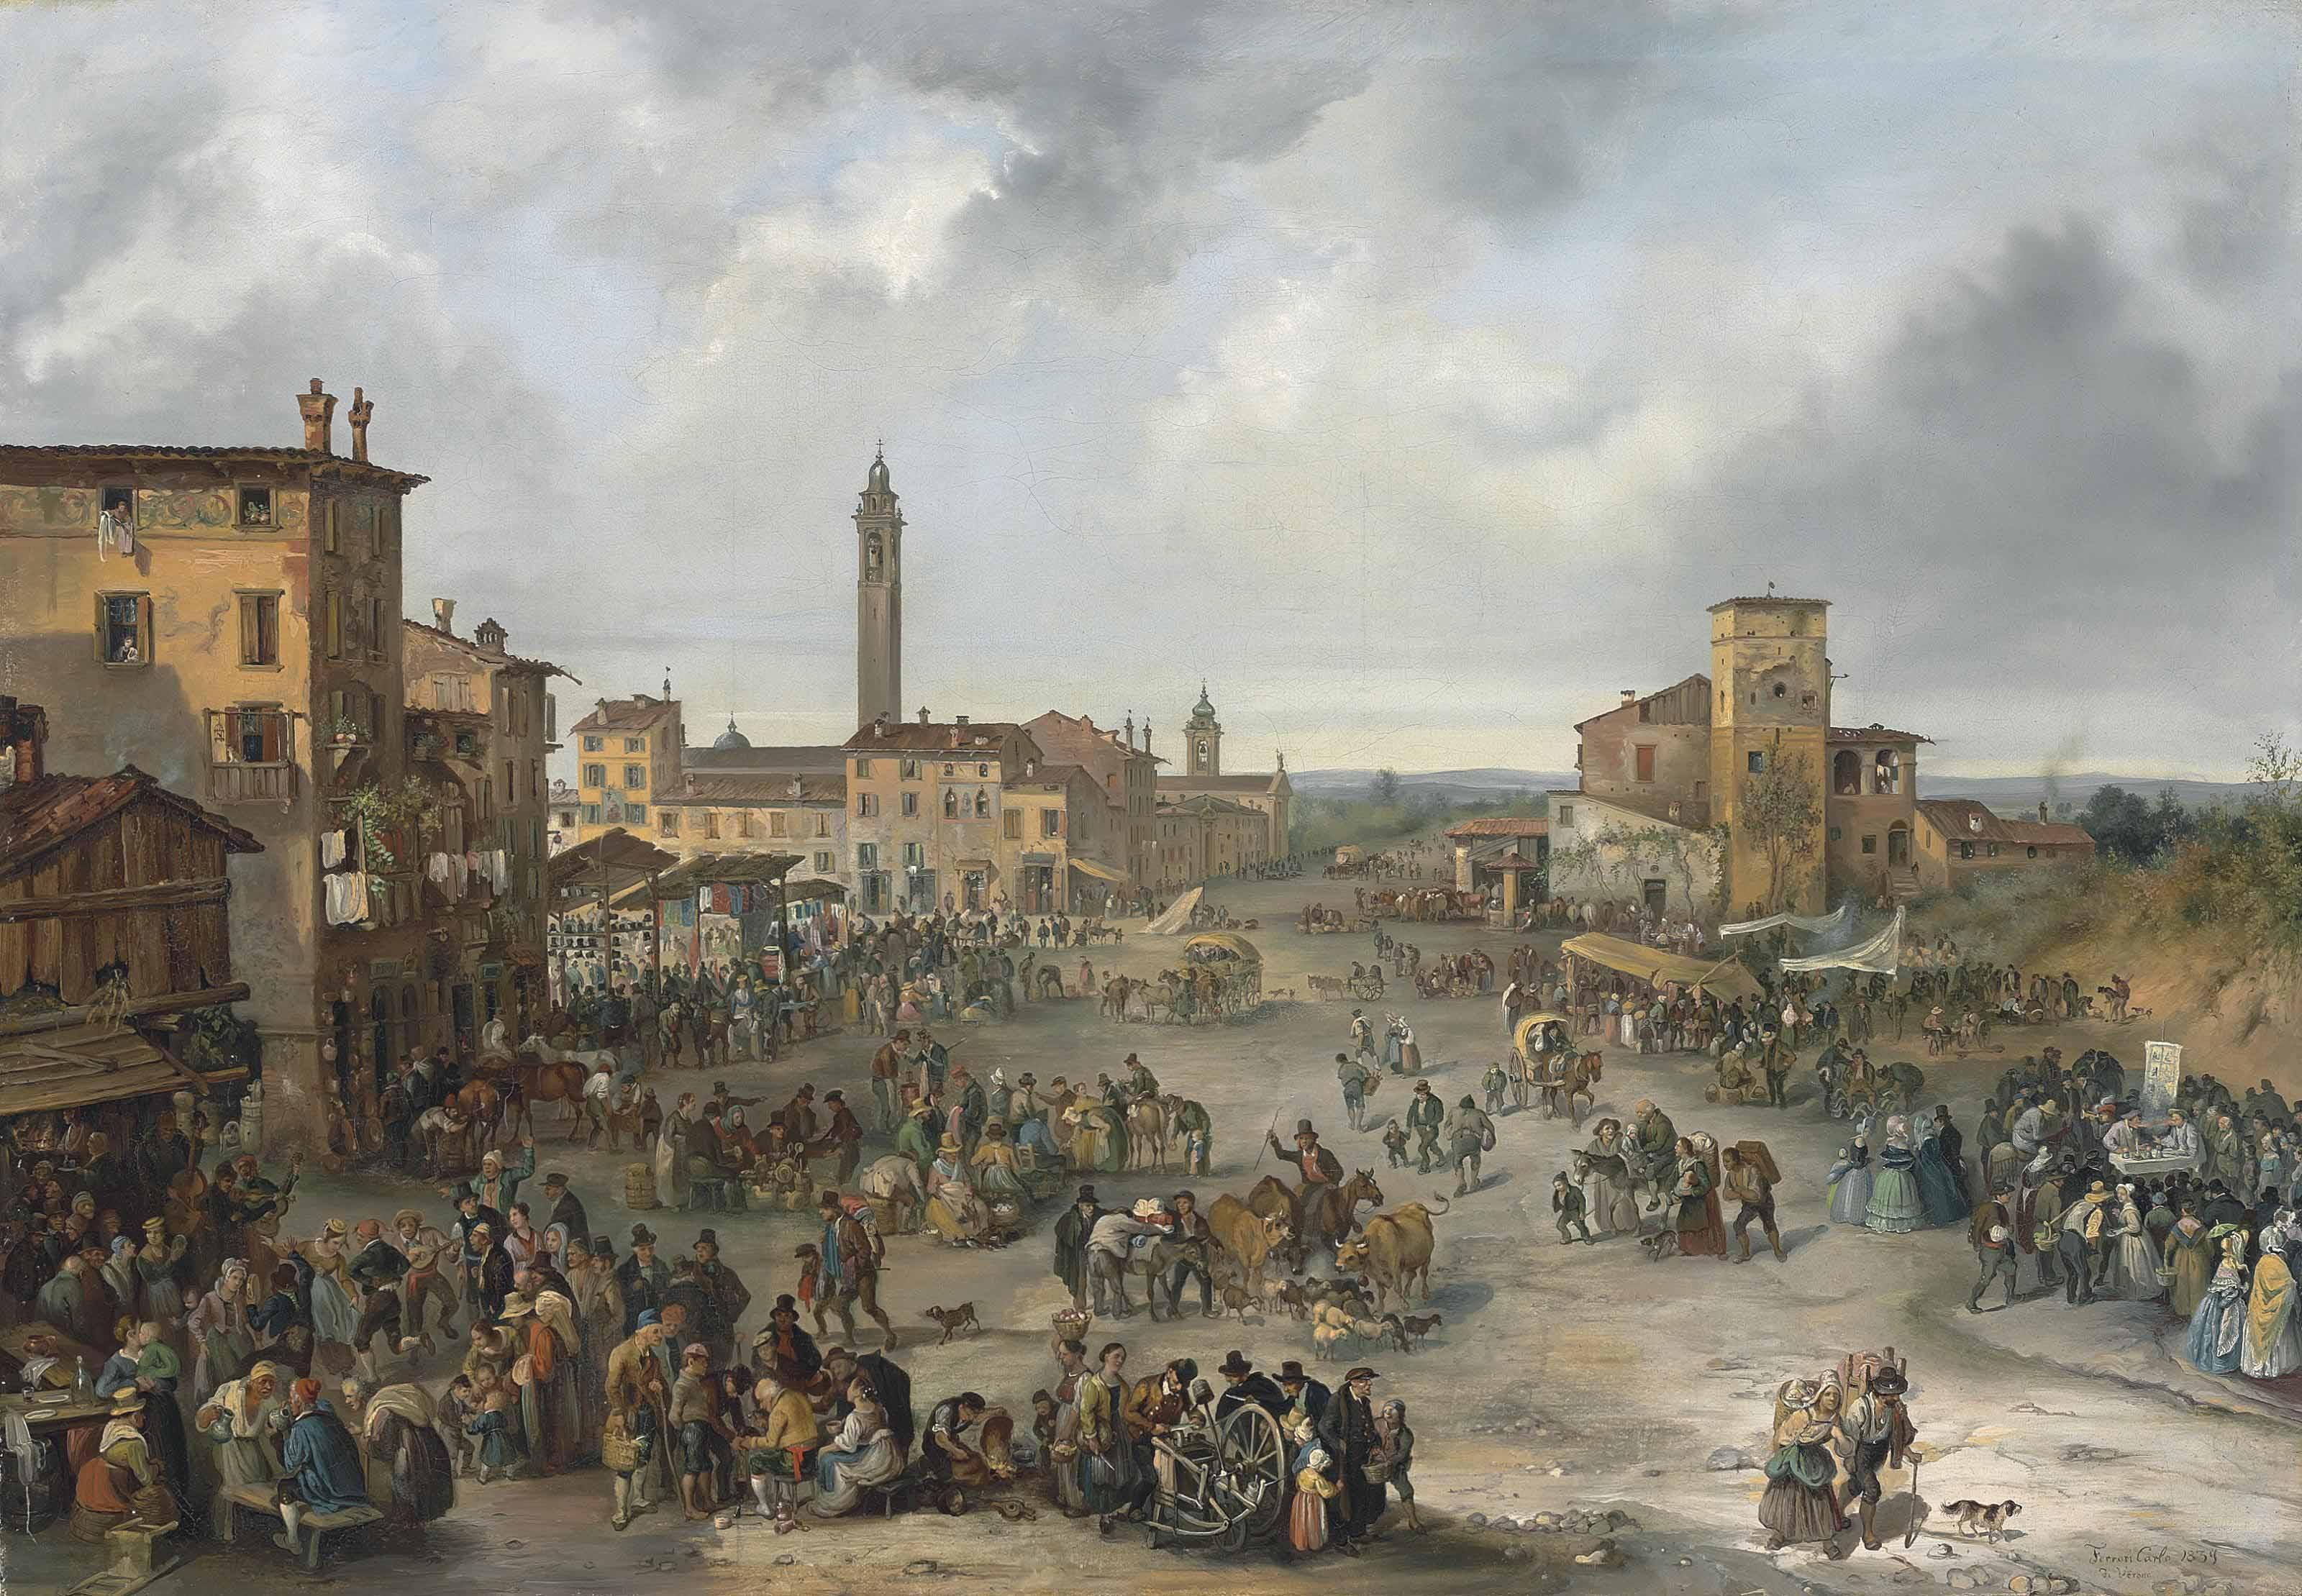 A market scene during the Fair of Sant' Alessandro, Bergamo